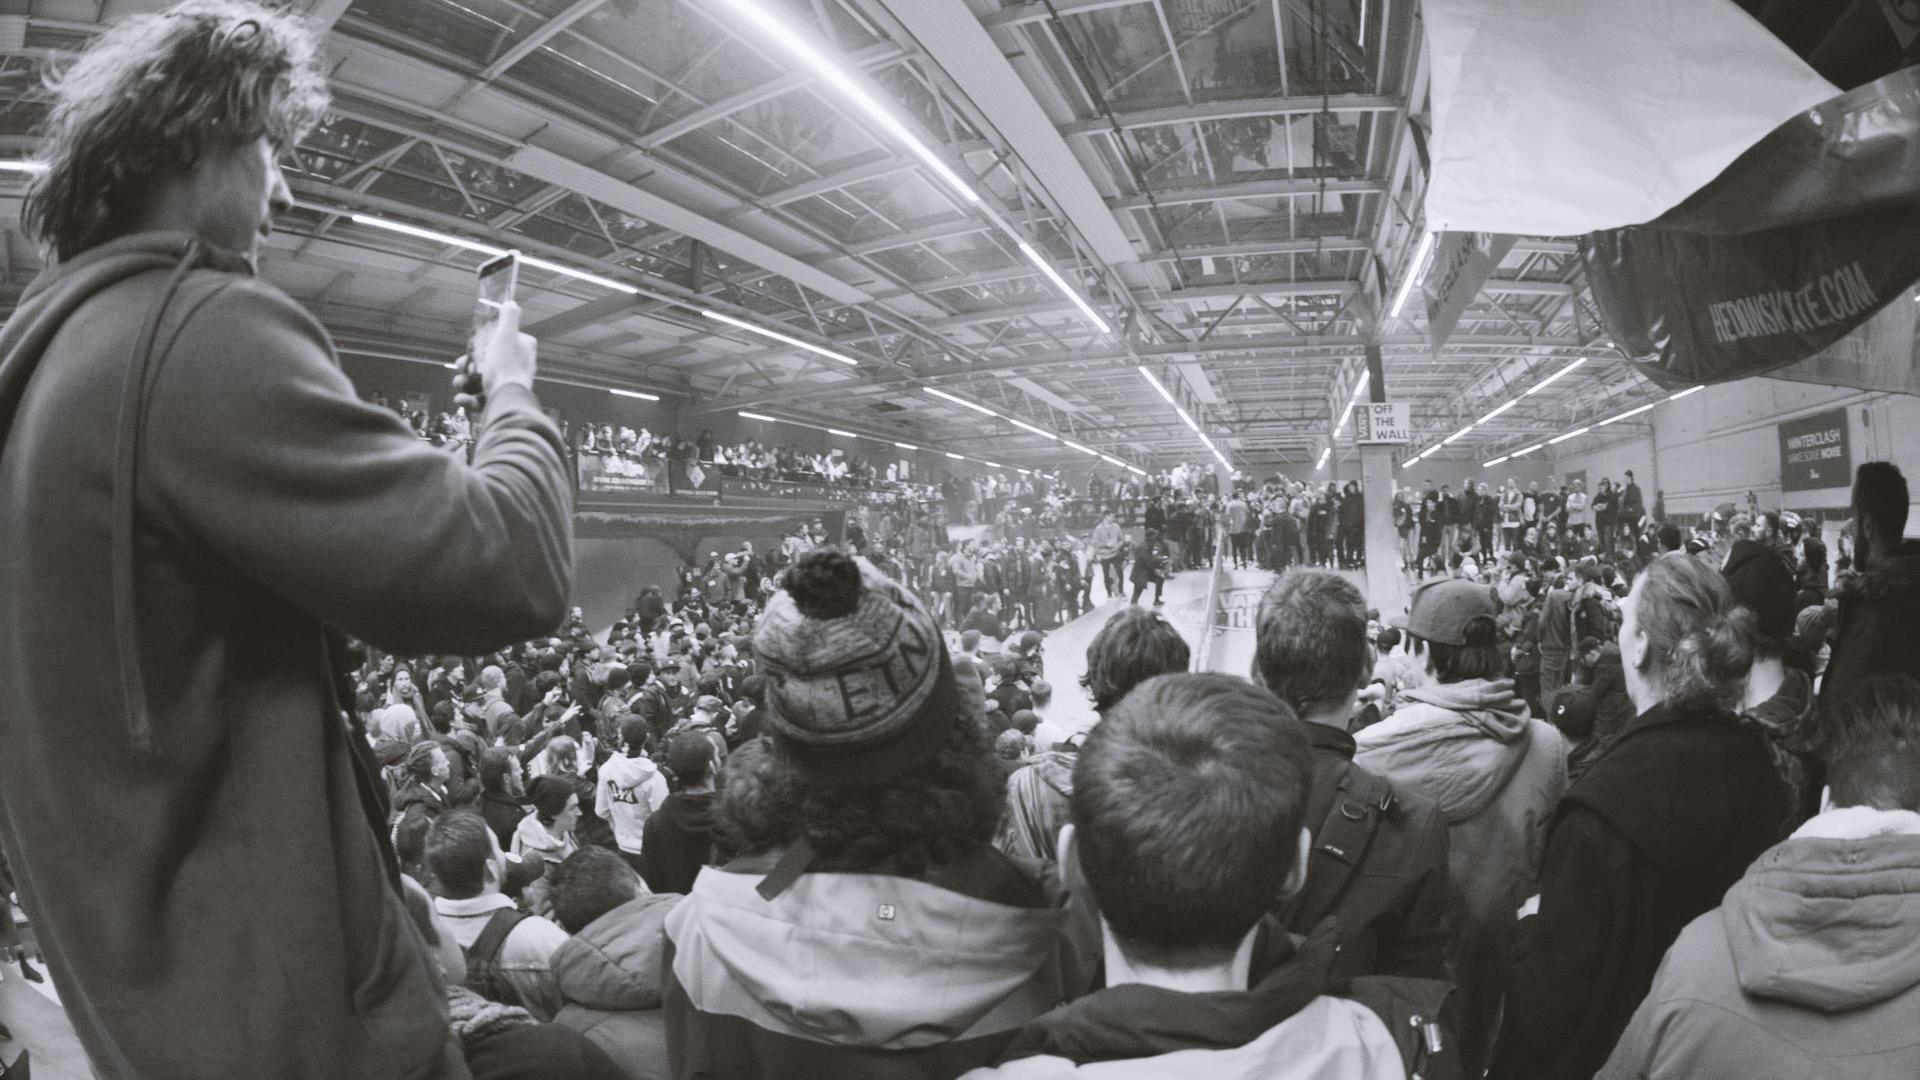 Crowd01.jpg